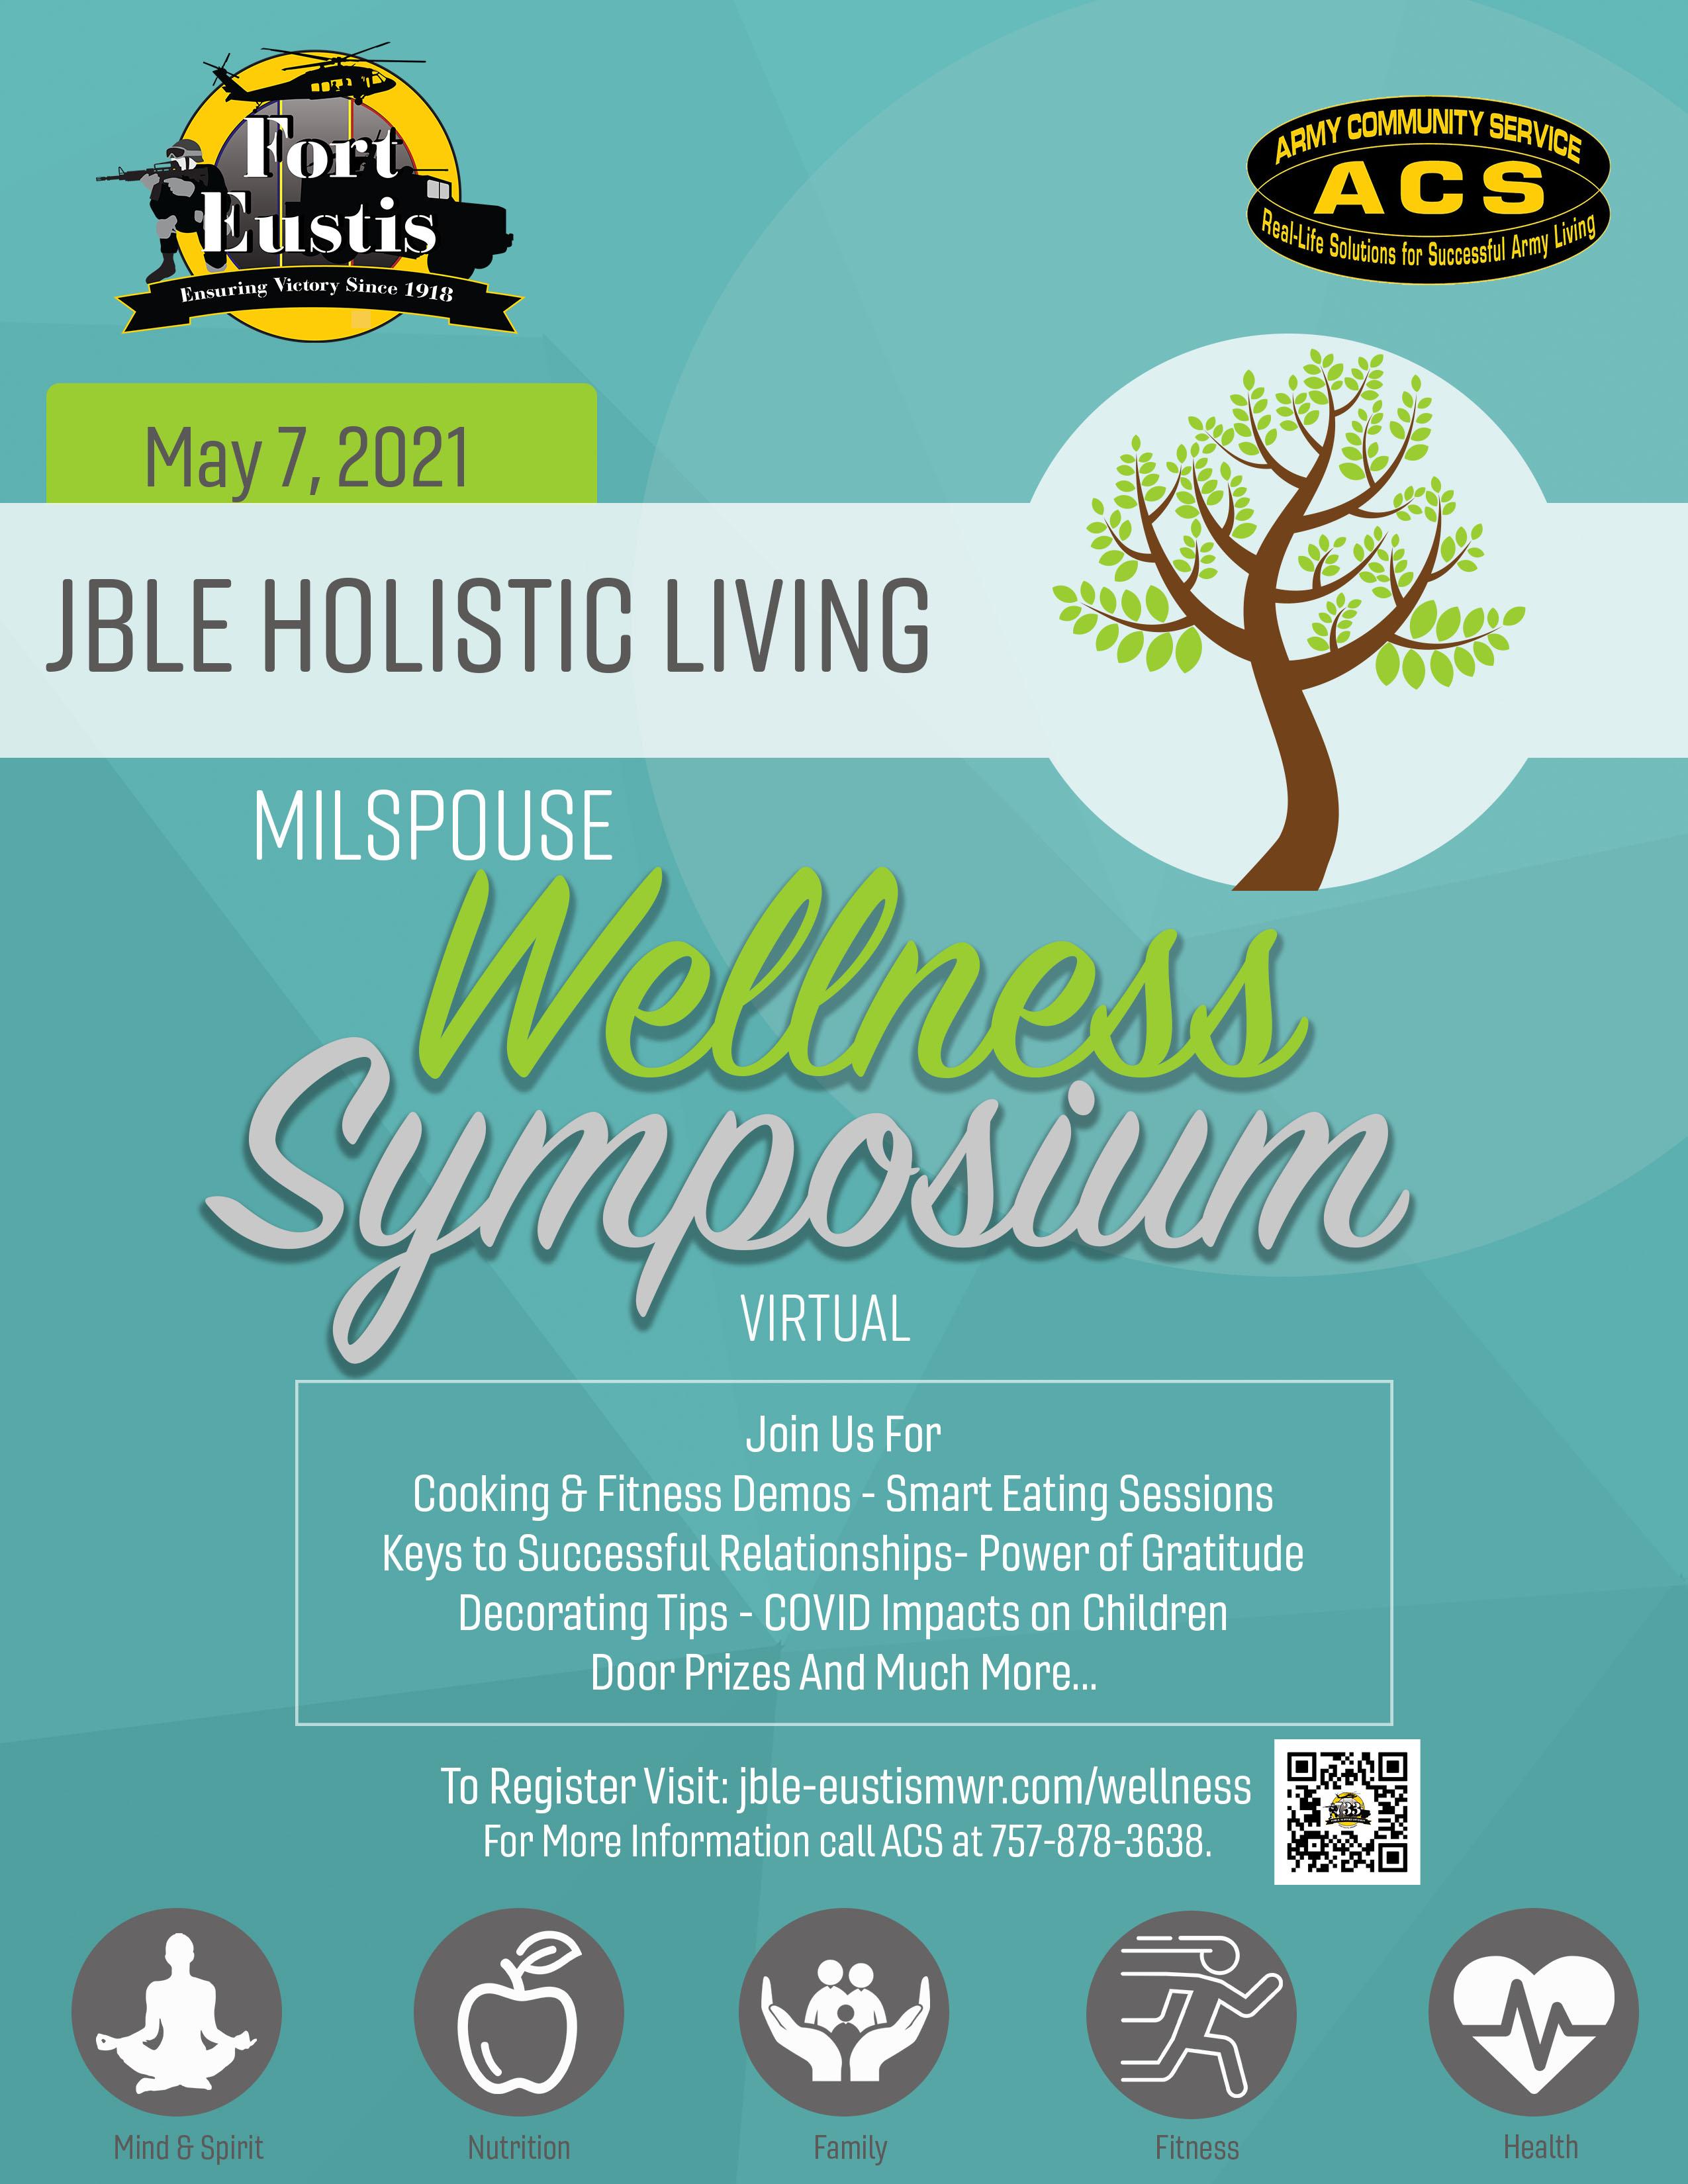 MILSPOUSE Wellness Symposium